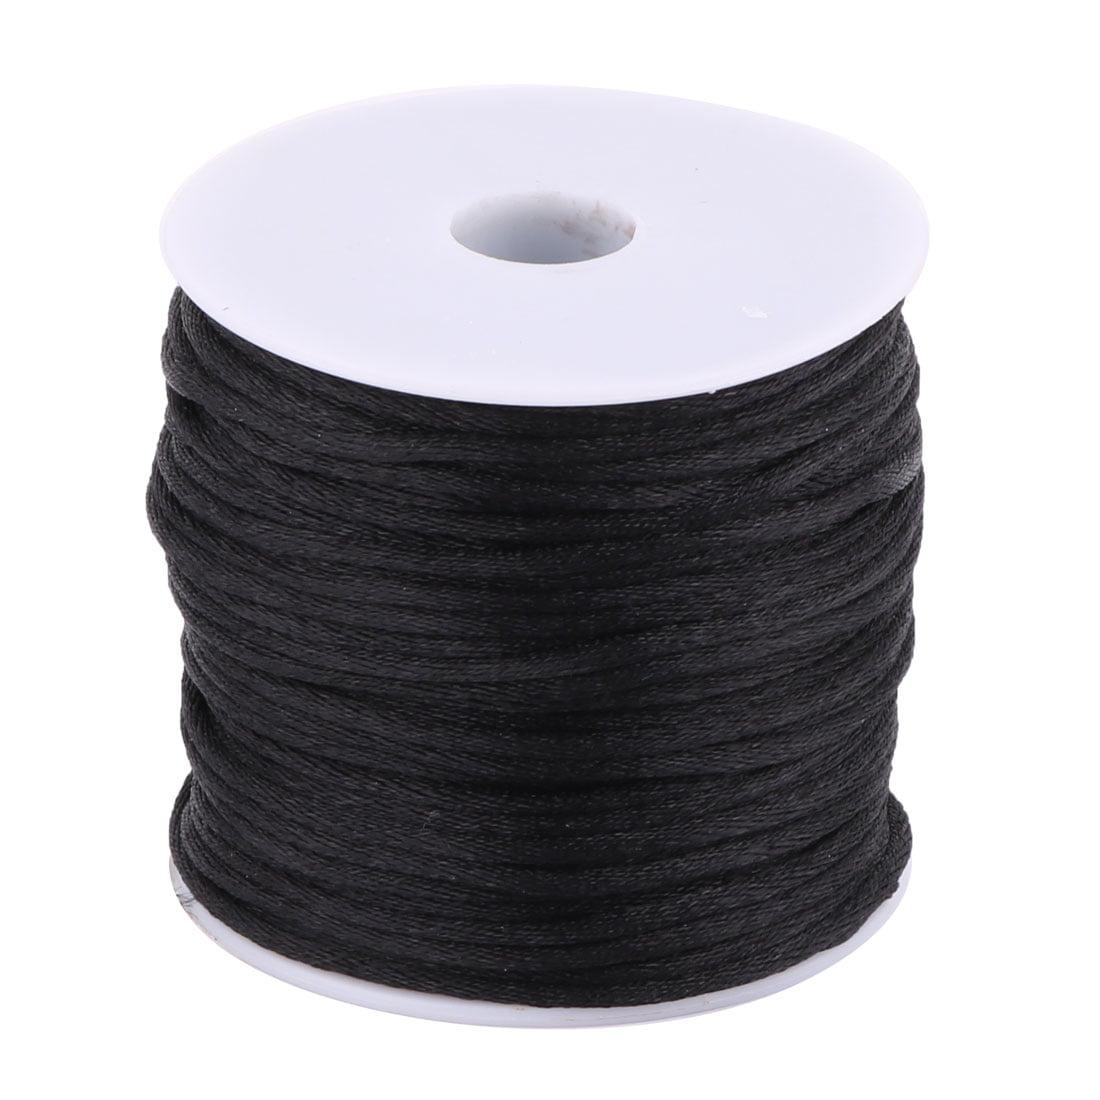 Nylon Handicraft DIY Knit Key Chains Doll Pendant Cord Black 2mm Dia 49 Yards